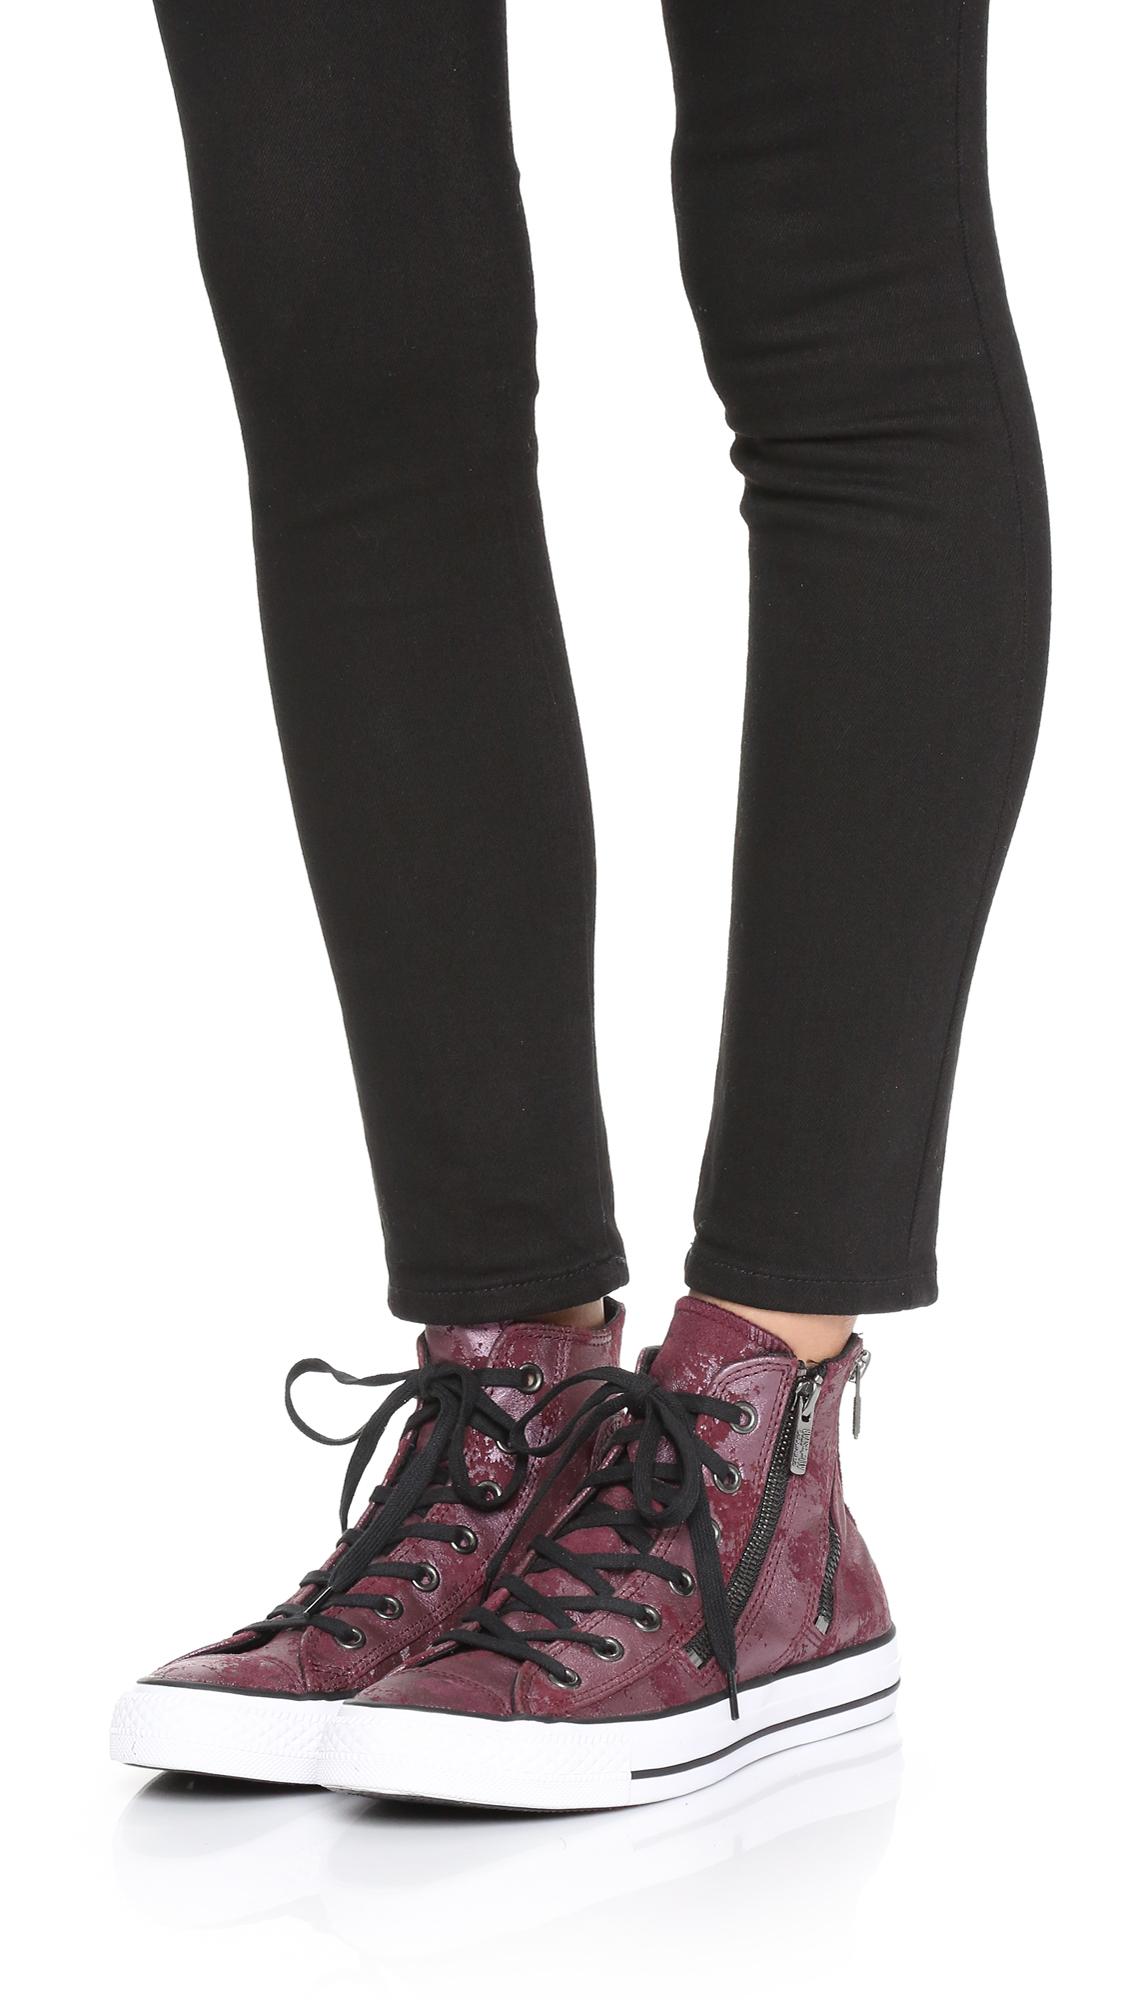 626f9d0cec5 Lyst - Converse Chuck Taylor All Star Dual Zip High Top Sneakers ...